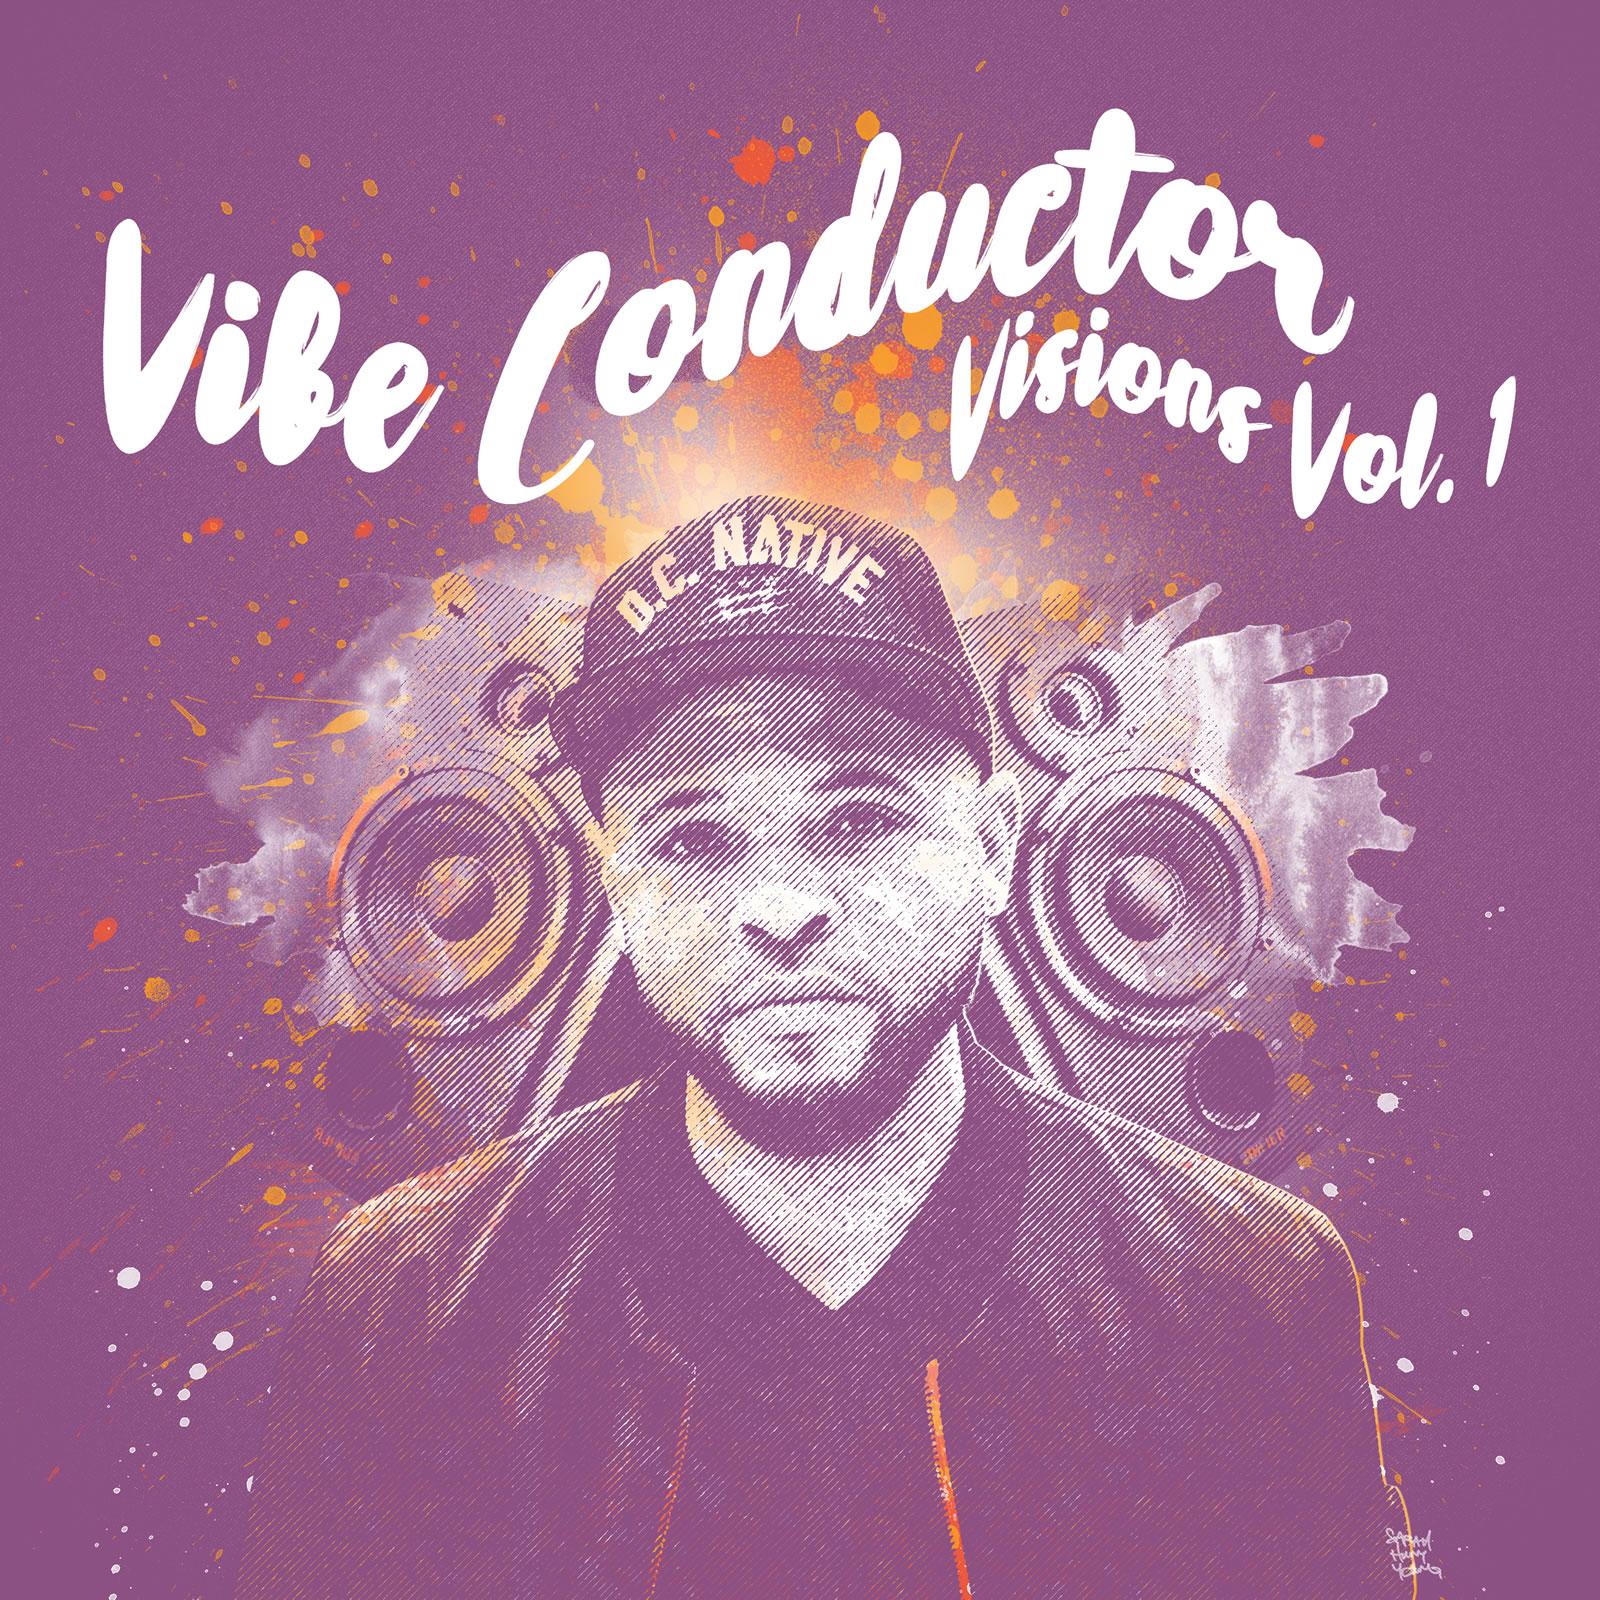 DJ Stylus - Vibe Conductor Visions Vol. 1